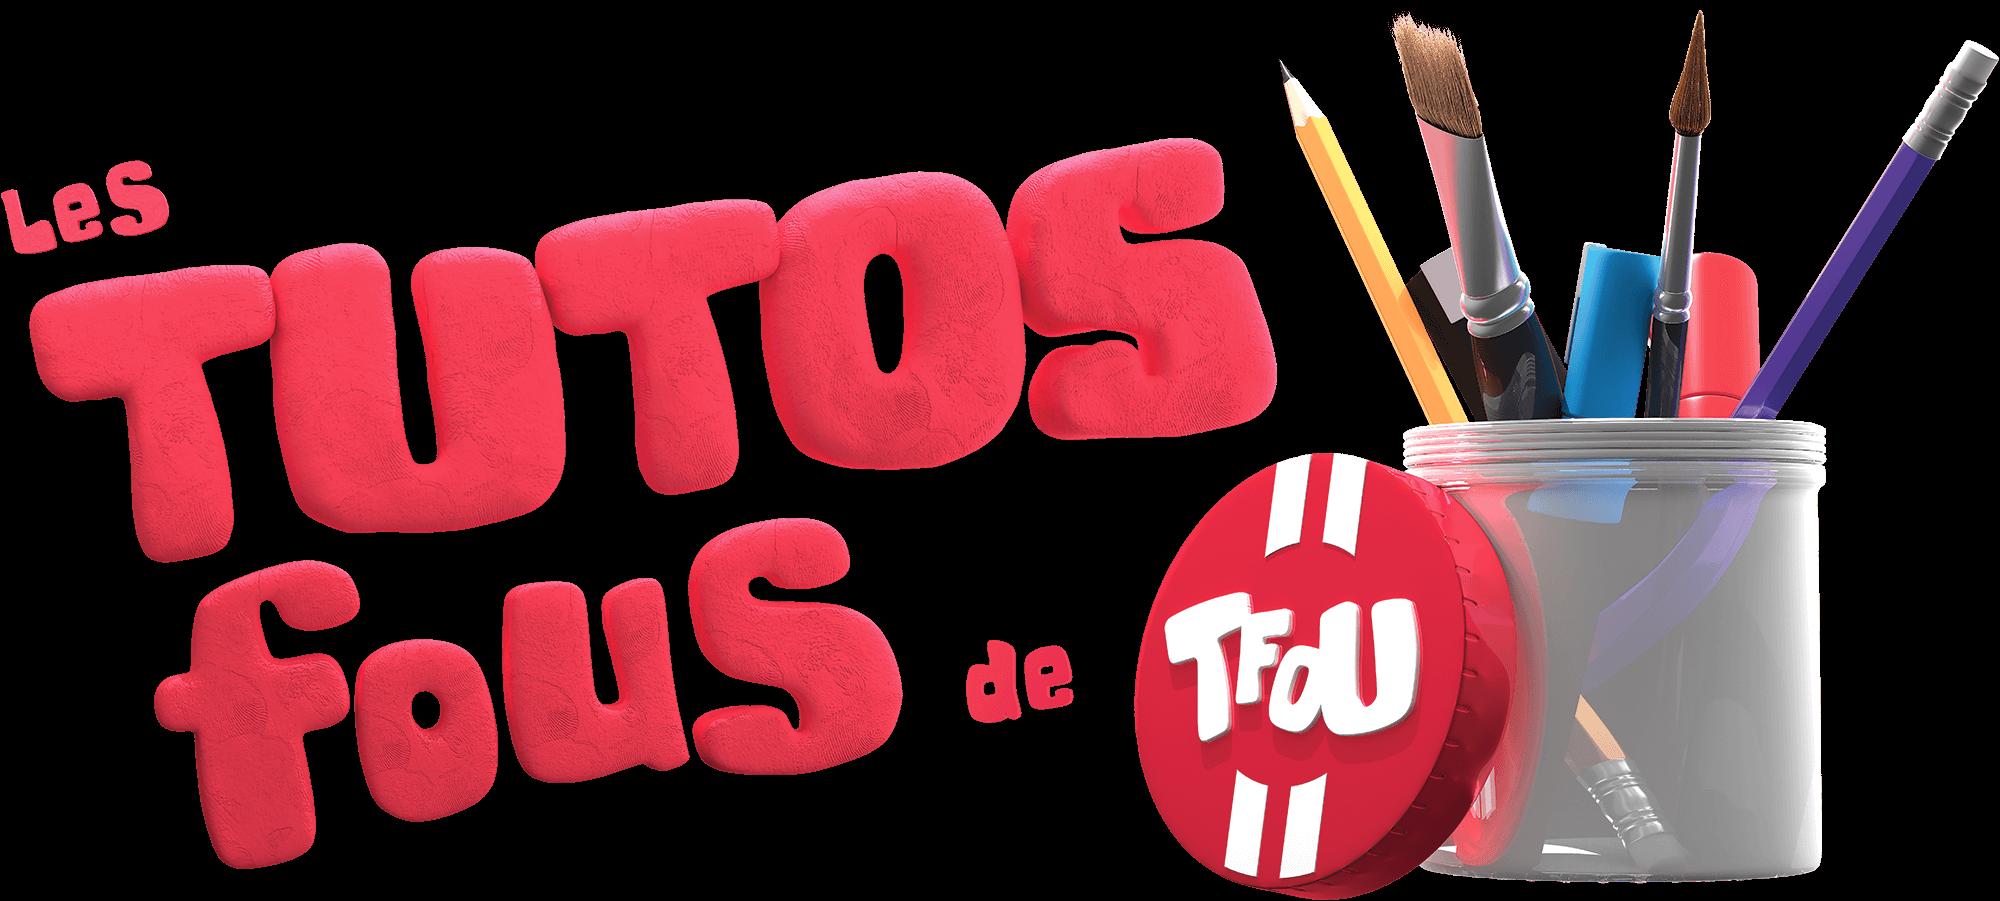 3D logo of the Tfou Les Tutos Fous TV show